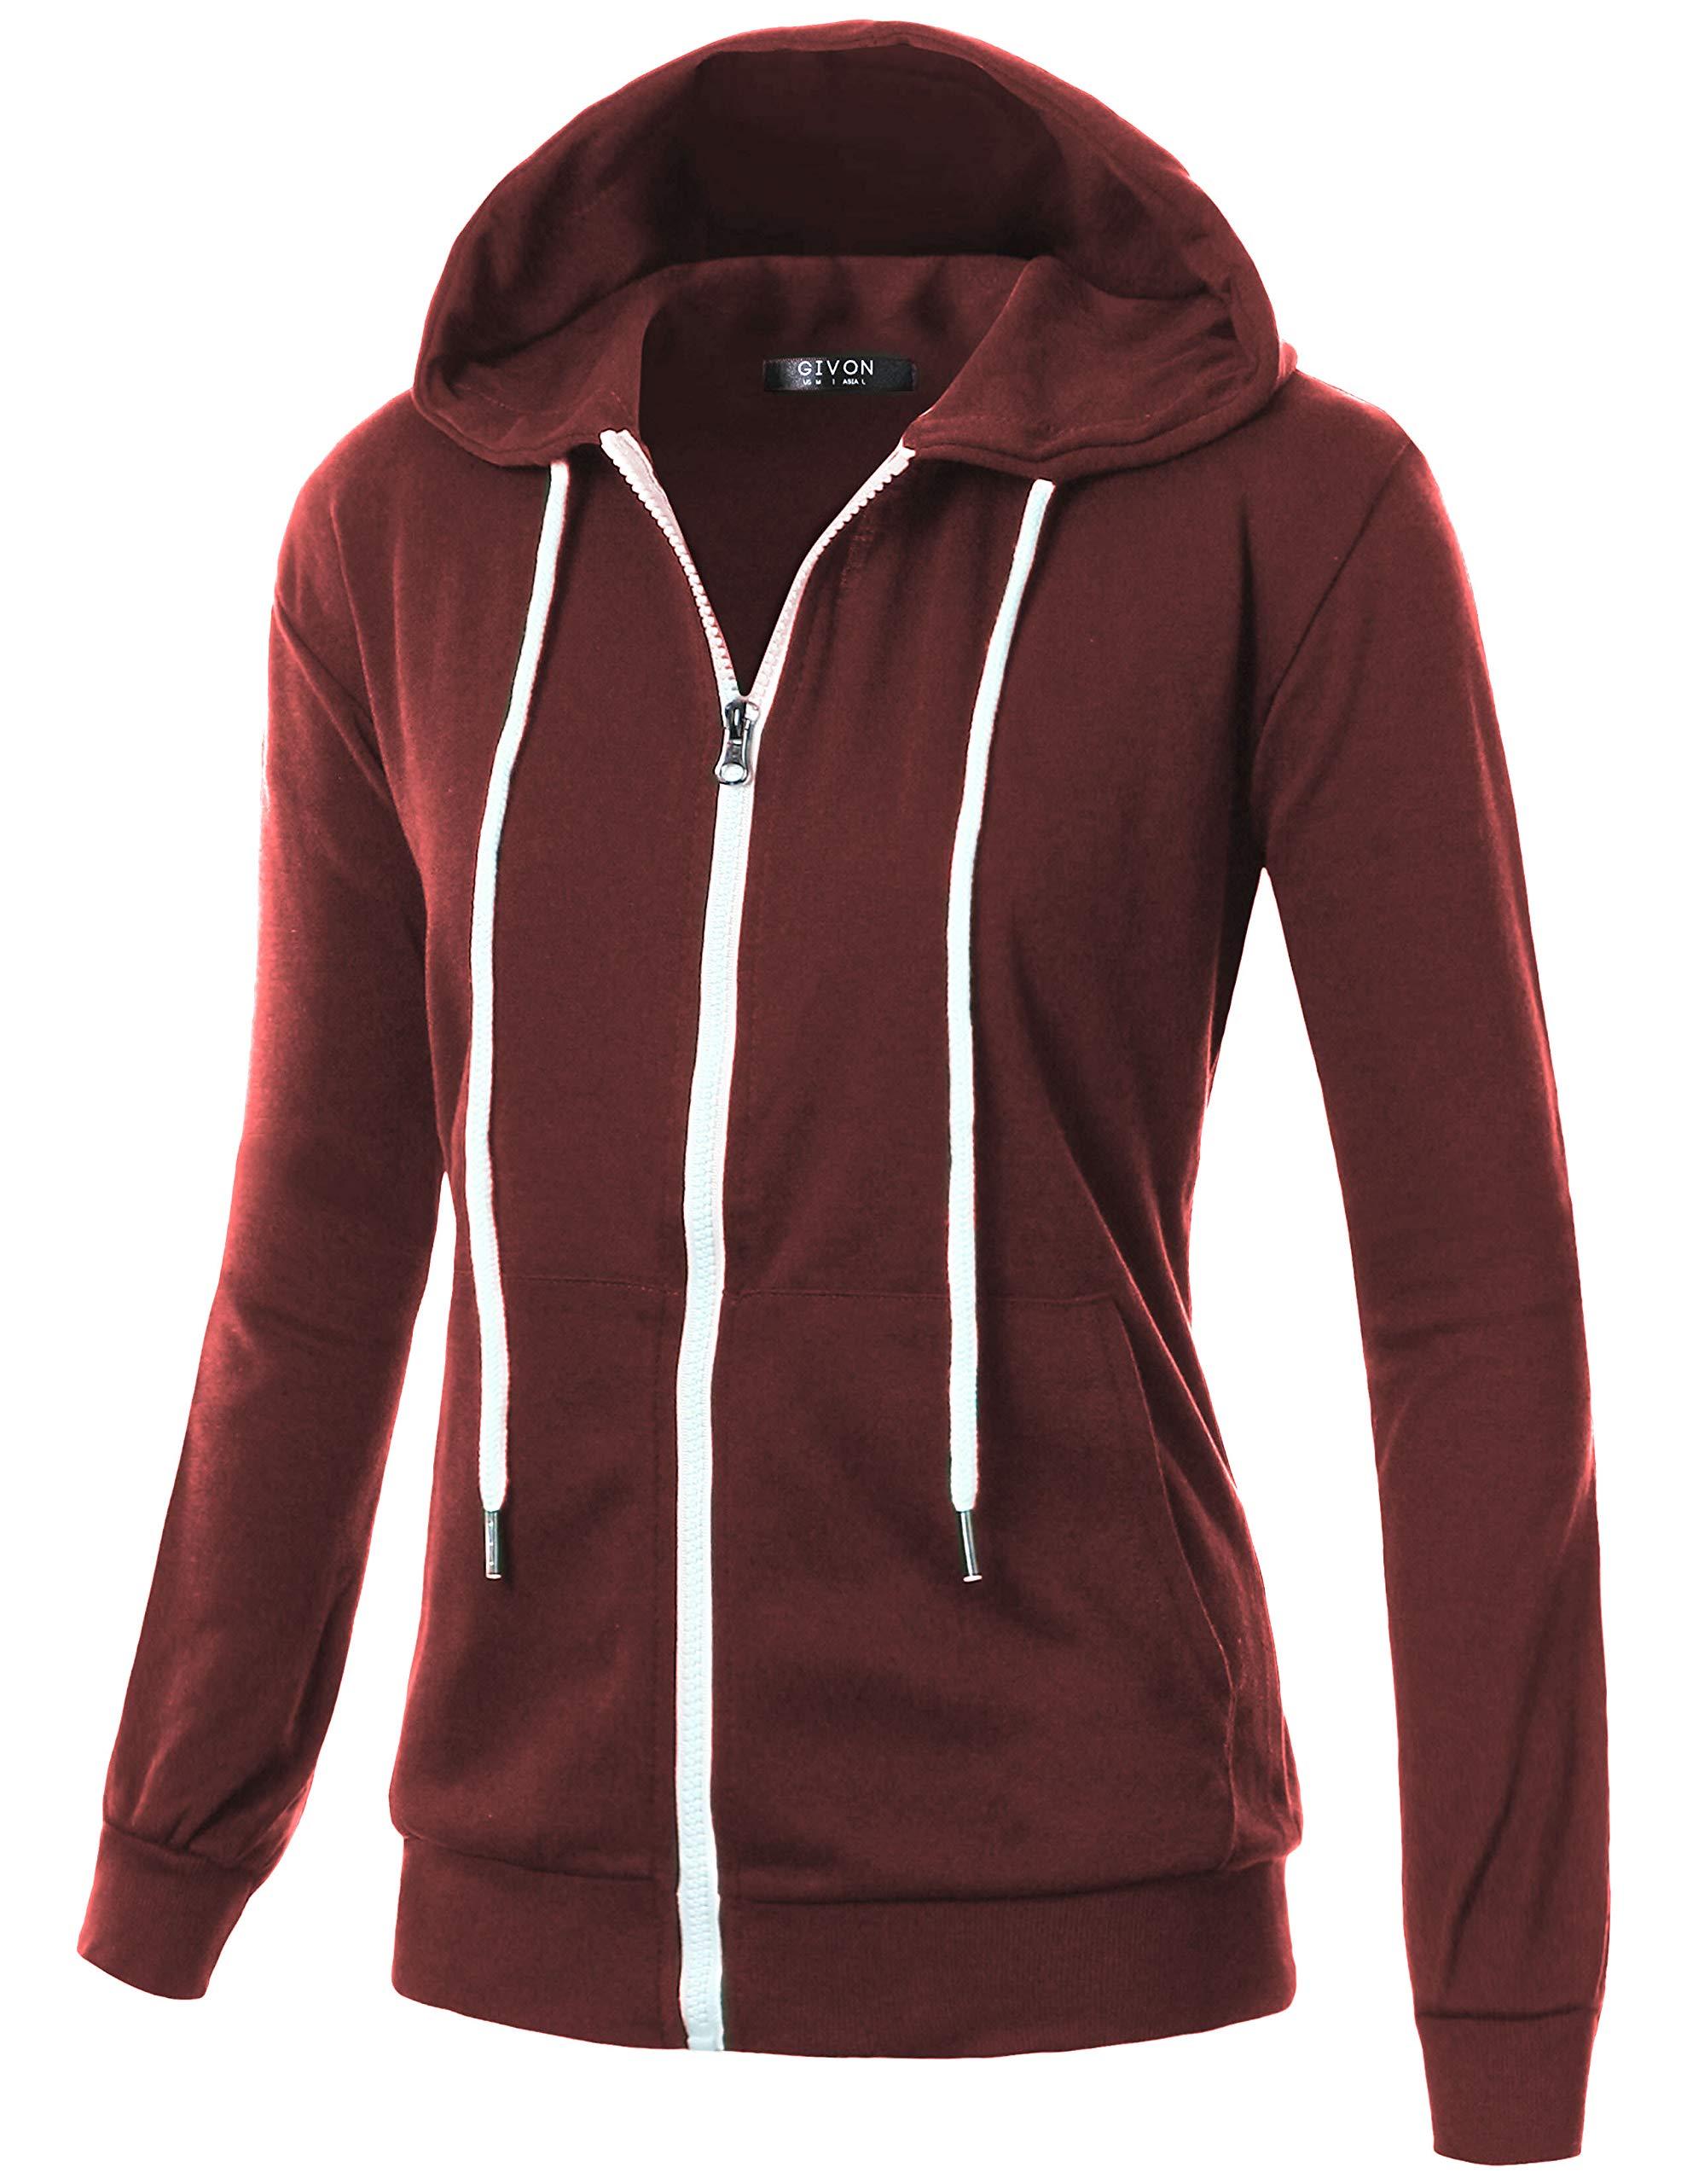 GIVON Womens Comfortable Long Sleeve Lightweight Zip-up Hoodie with Kanga Pocket/DCF200-BURGUNDY-S